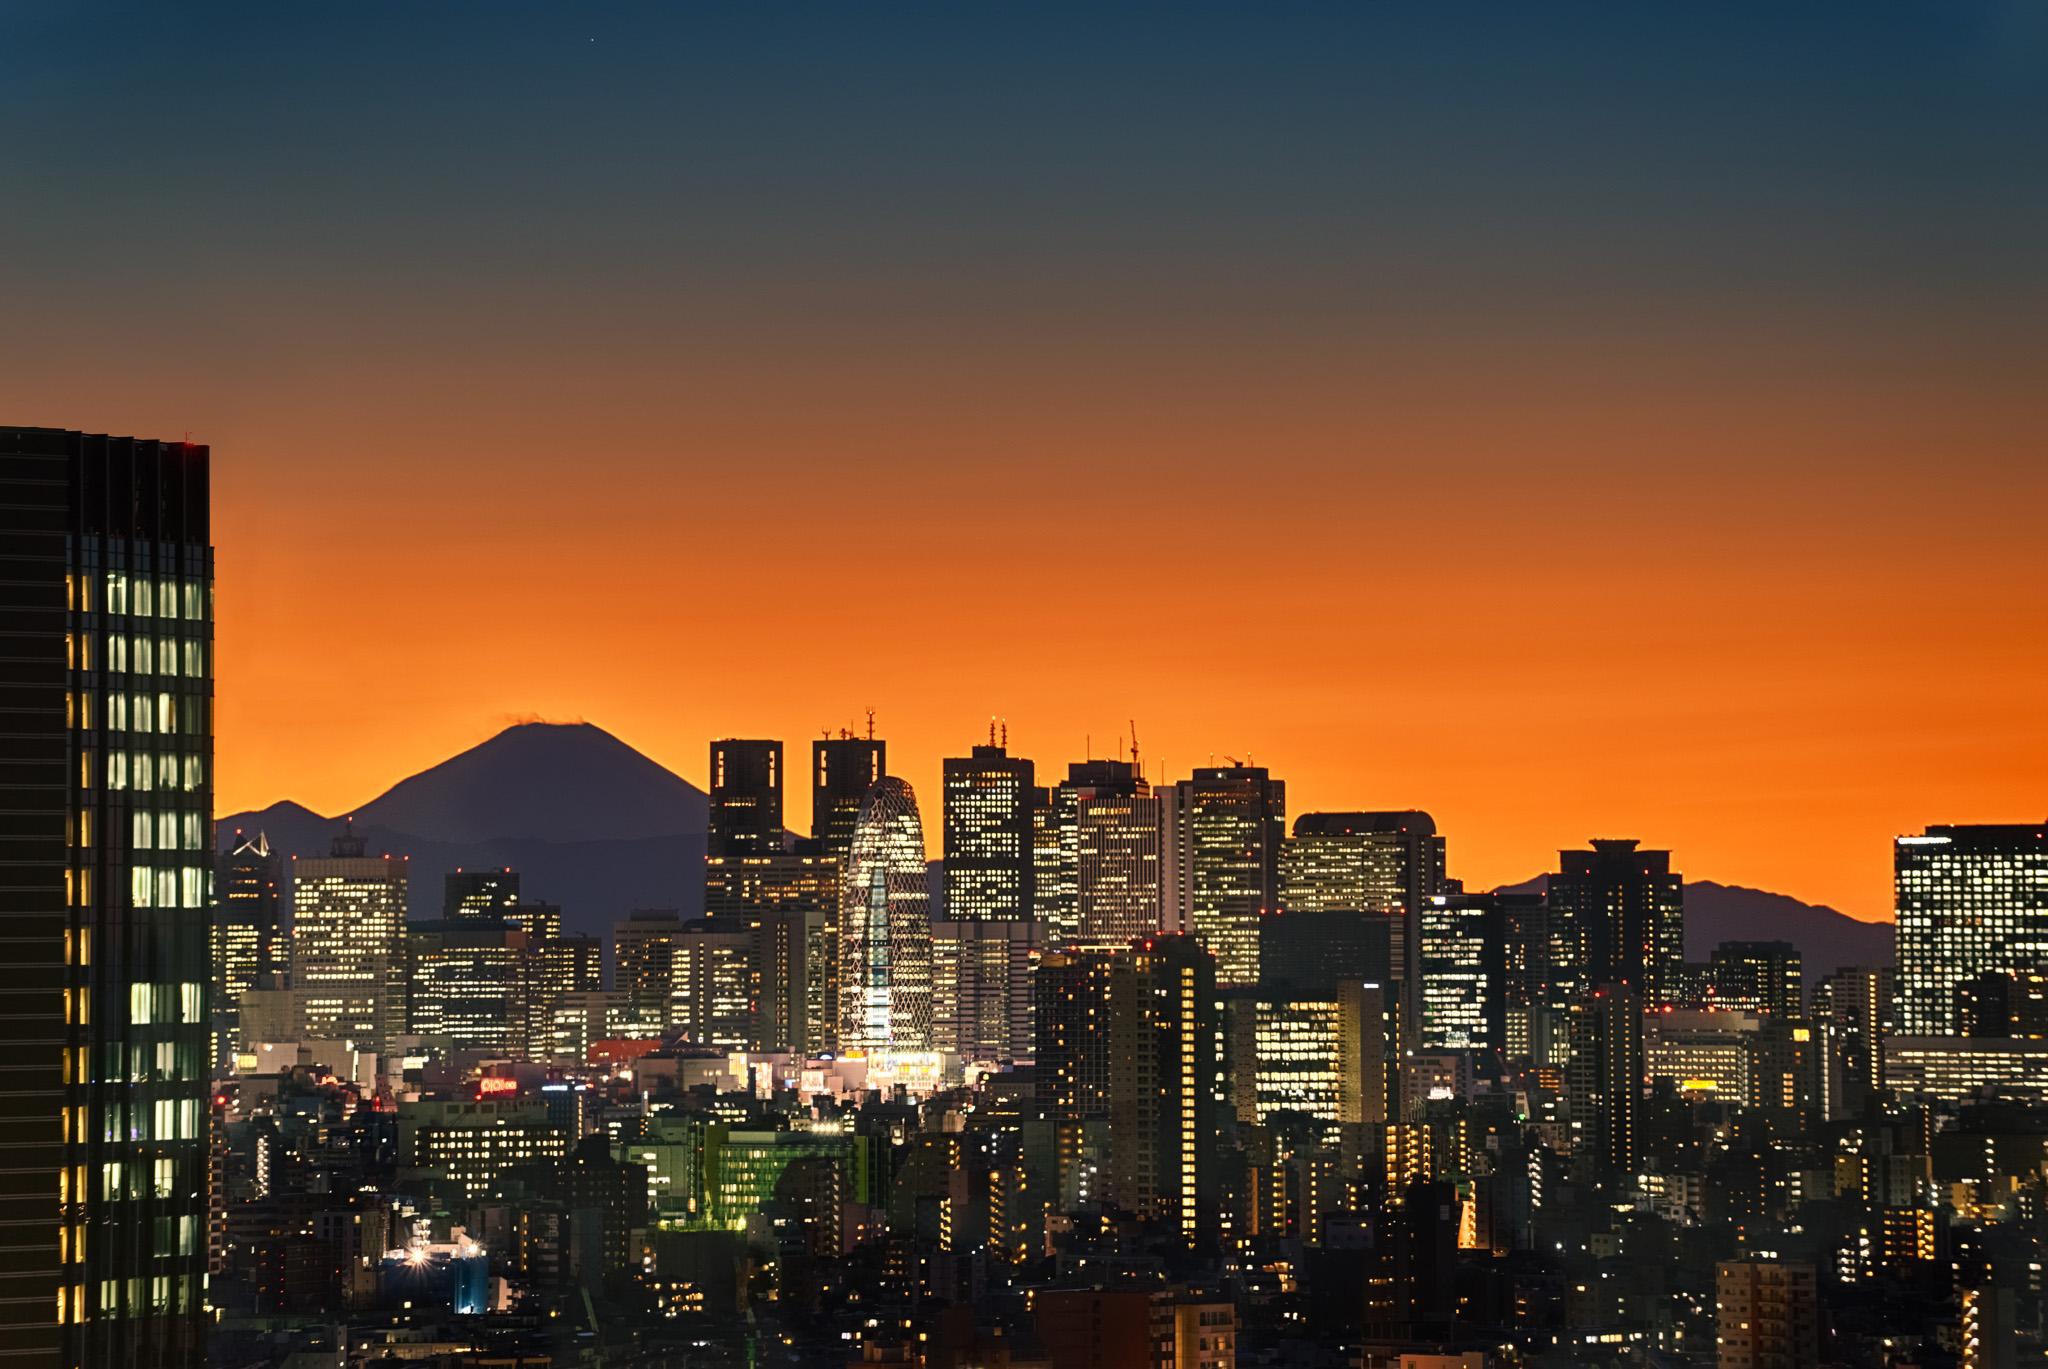 PHOTOGRAPHY: Andy Yee • Sony Sony a7R • FE 70-200mm F4 G OSS @ 171MM • Ƒ/9.5 • bulb• ISO 100